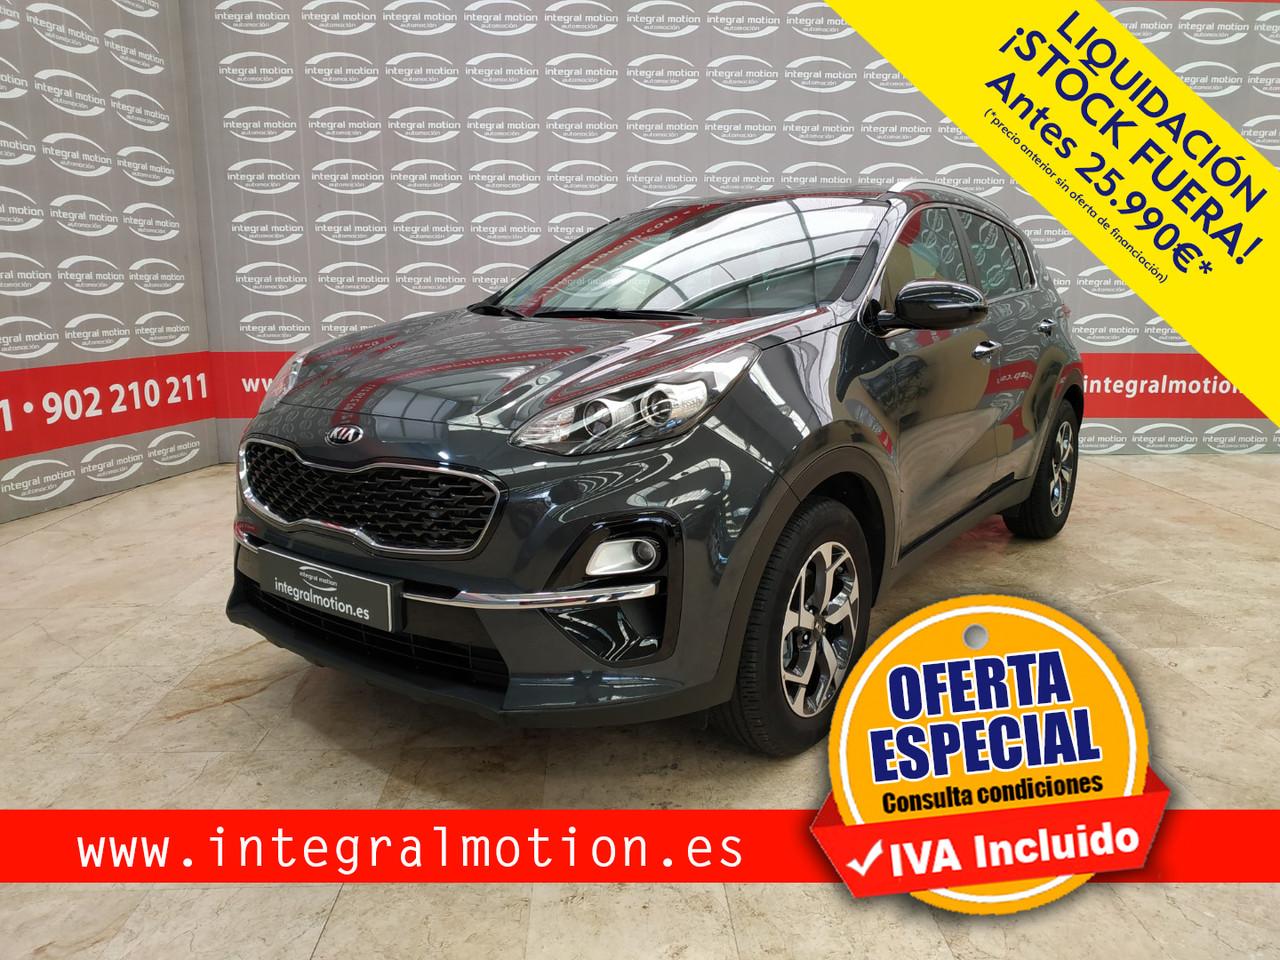 Kia Sportage 1.6 MHEV Drive Plus 85kW (115CV) 4x2  - Foto 1